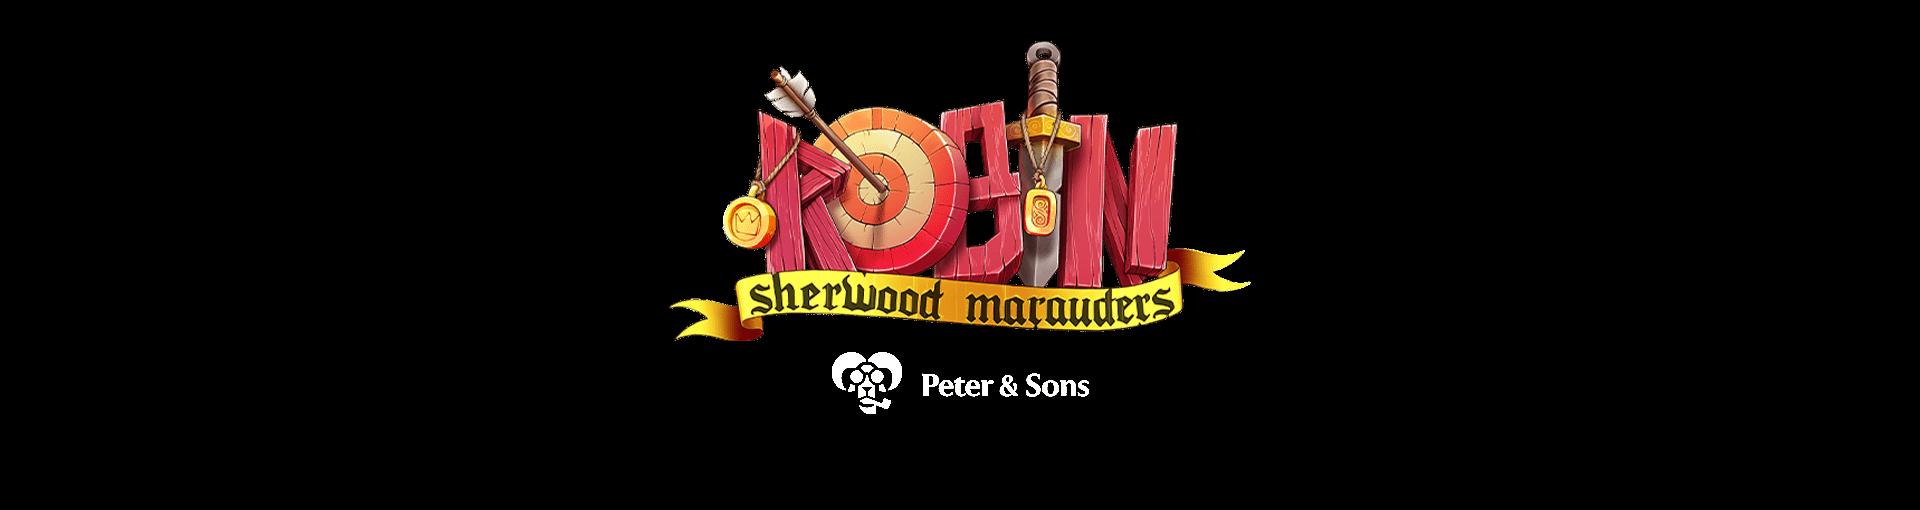 robin_sherwood_Yggdrasil-UpcomingGame-Logo-Template-1920x510px